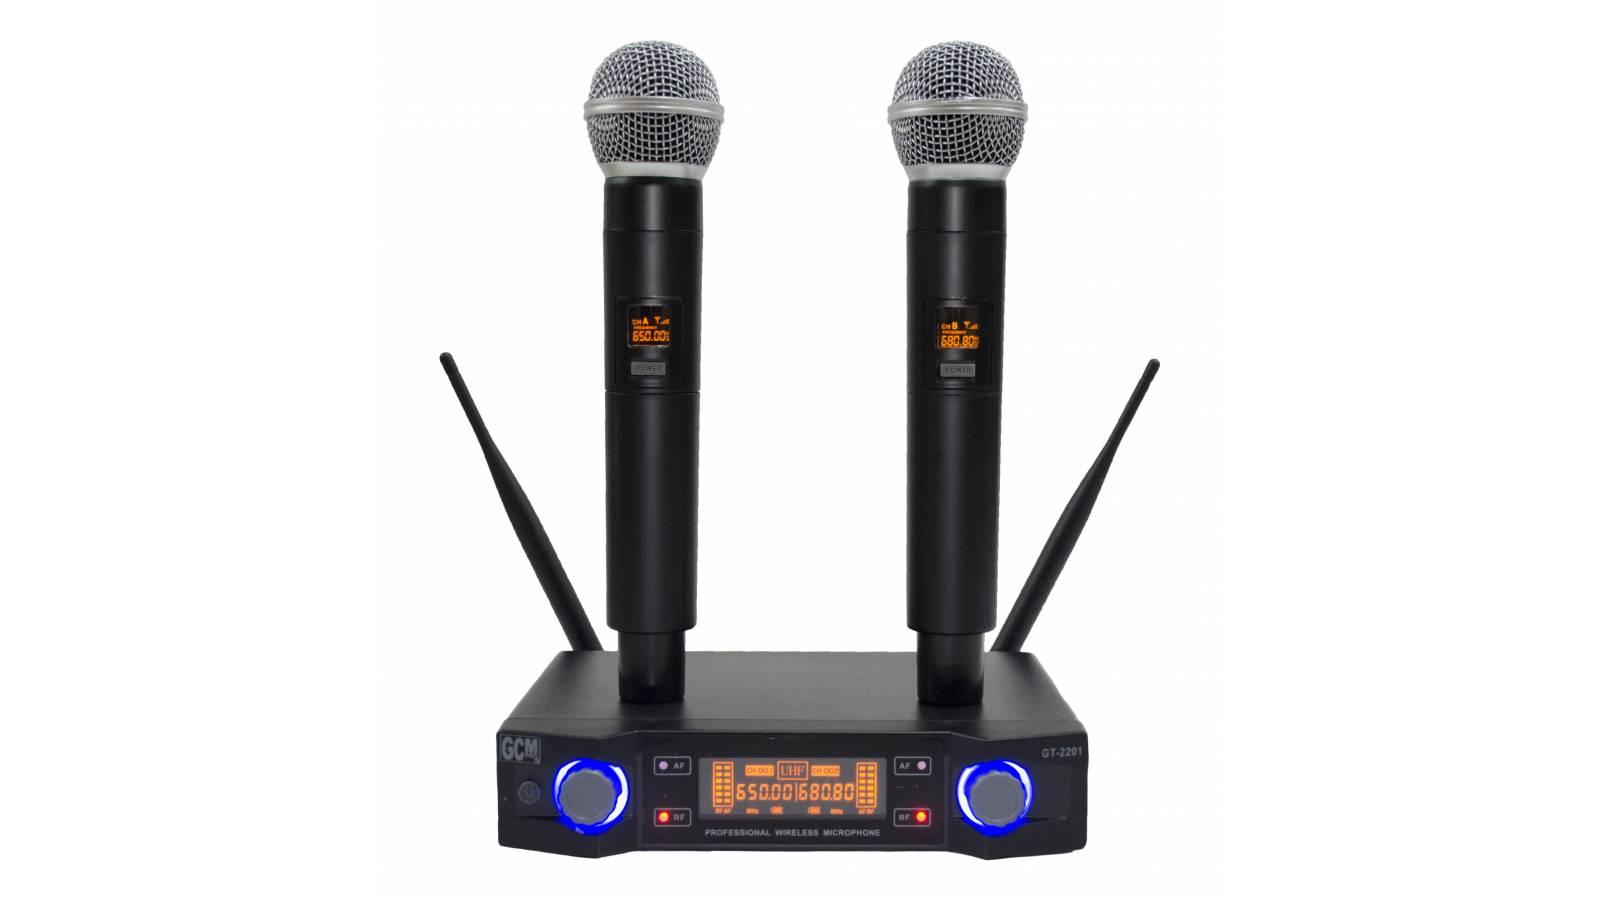 Microfono inalambrico doble de mano GT-2201 UHF GCM Pro